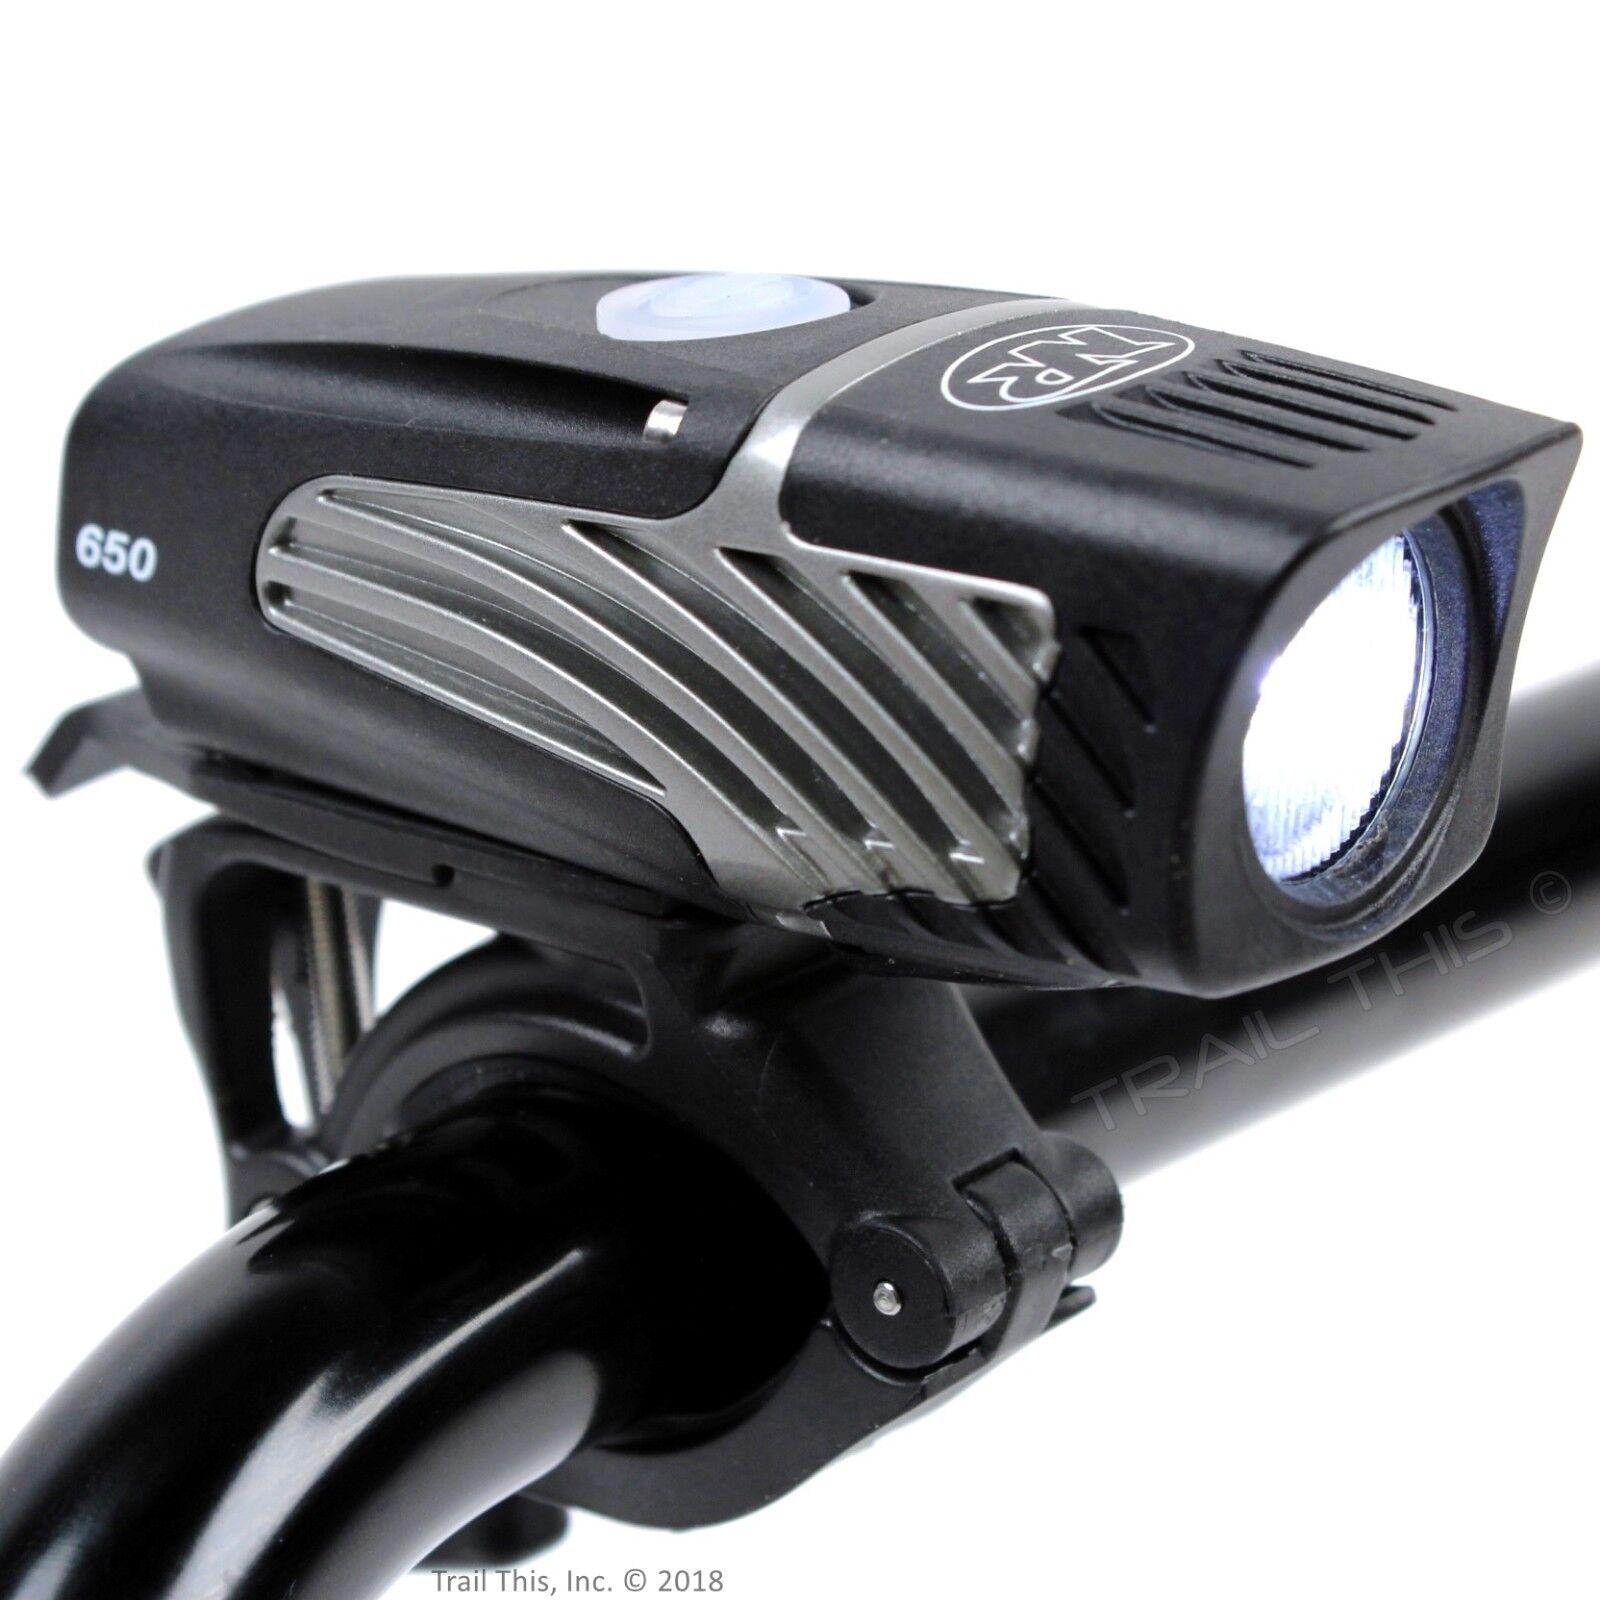 Niterider Lumina Micro 650 Lumens Cree LED Bicycle Headlight